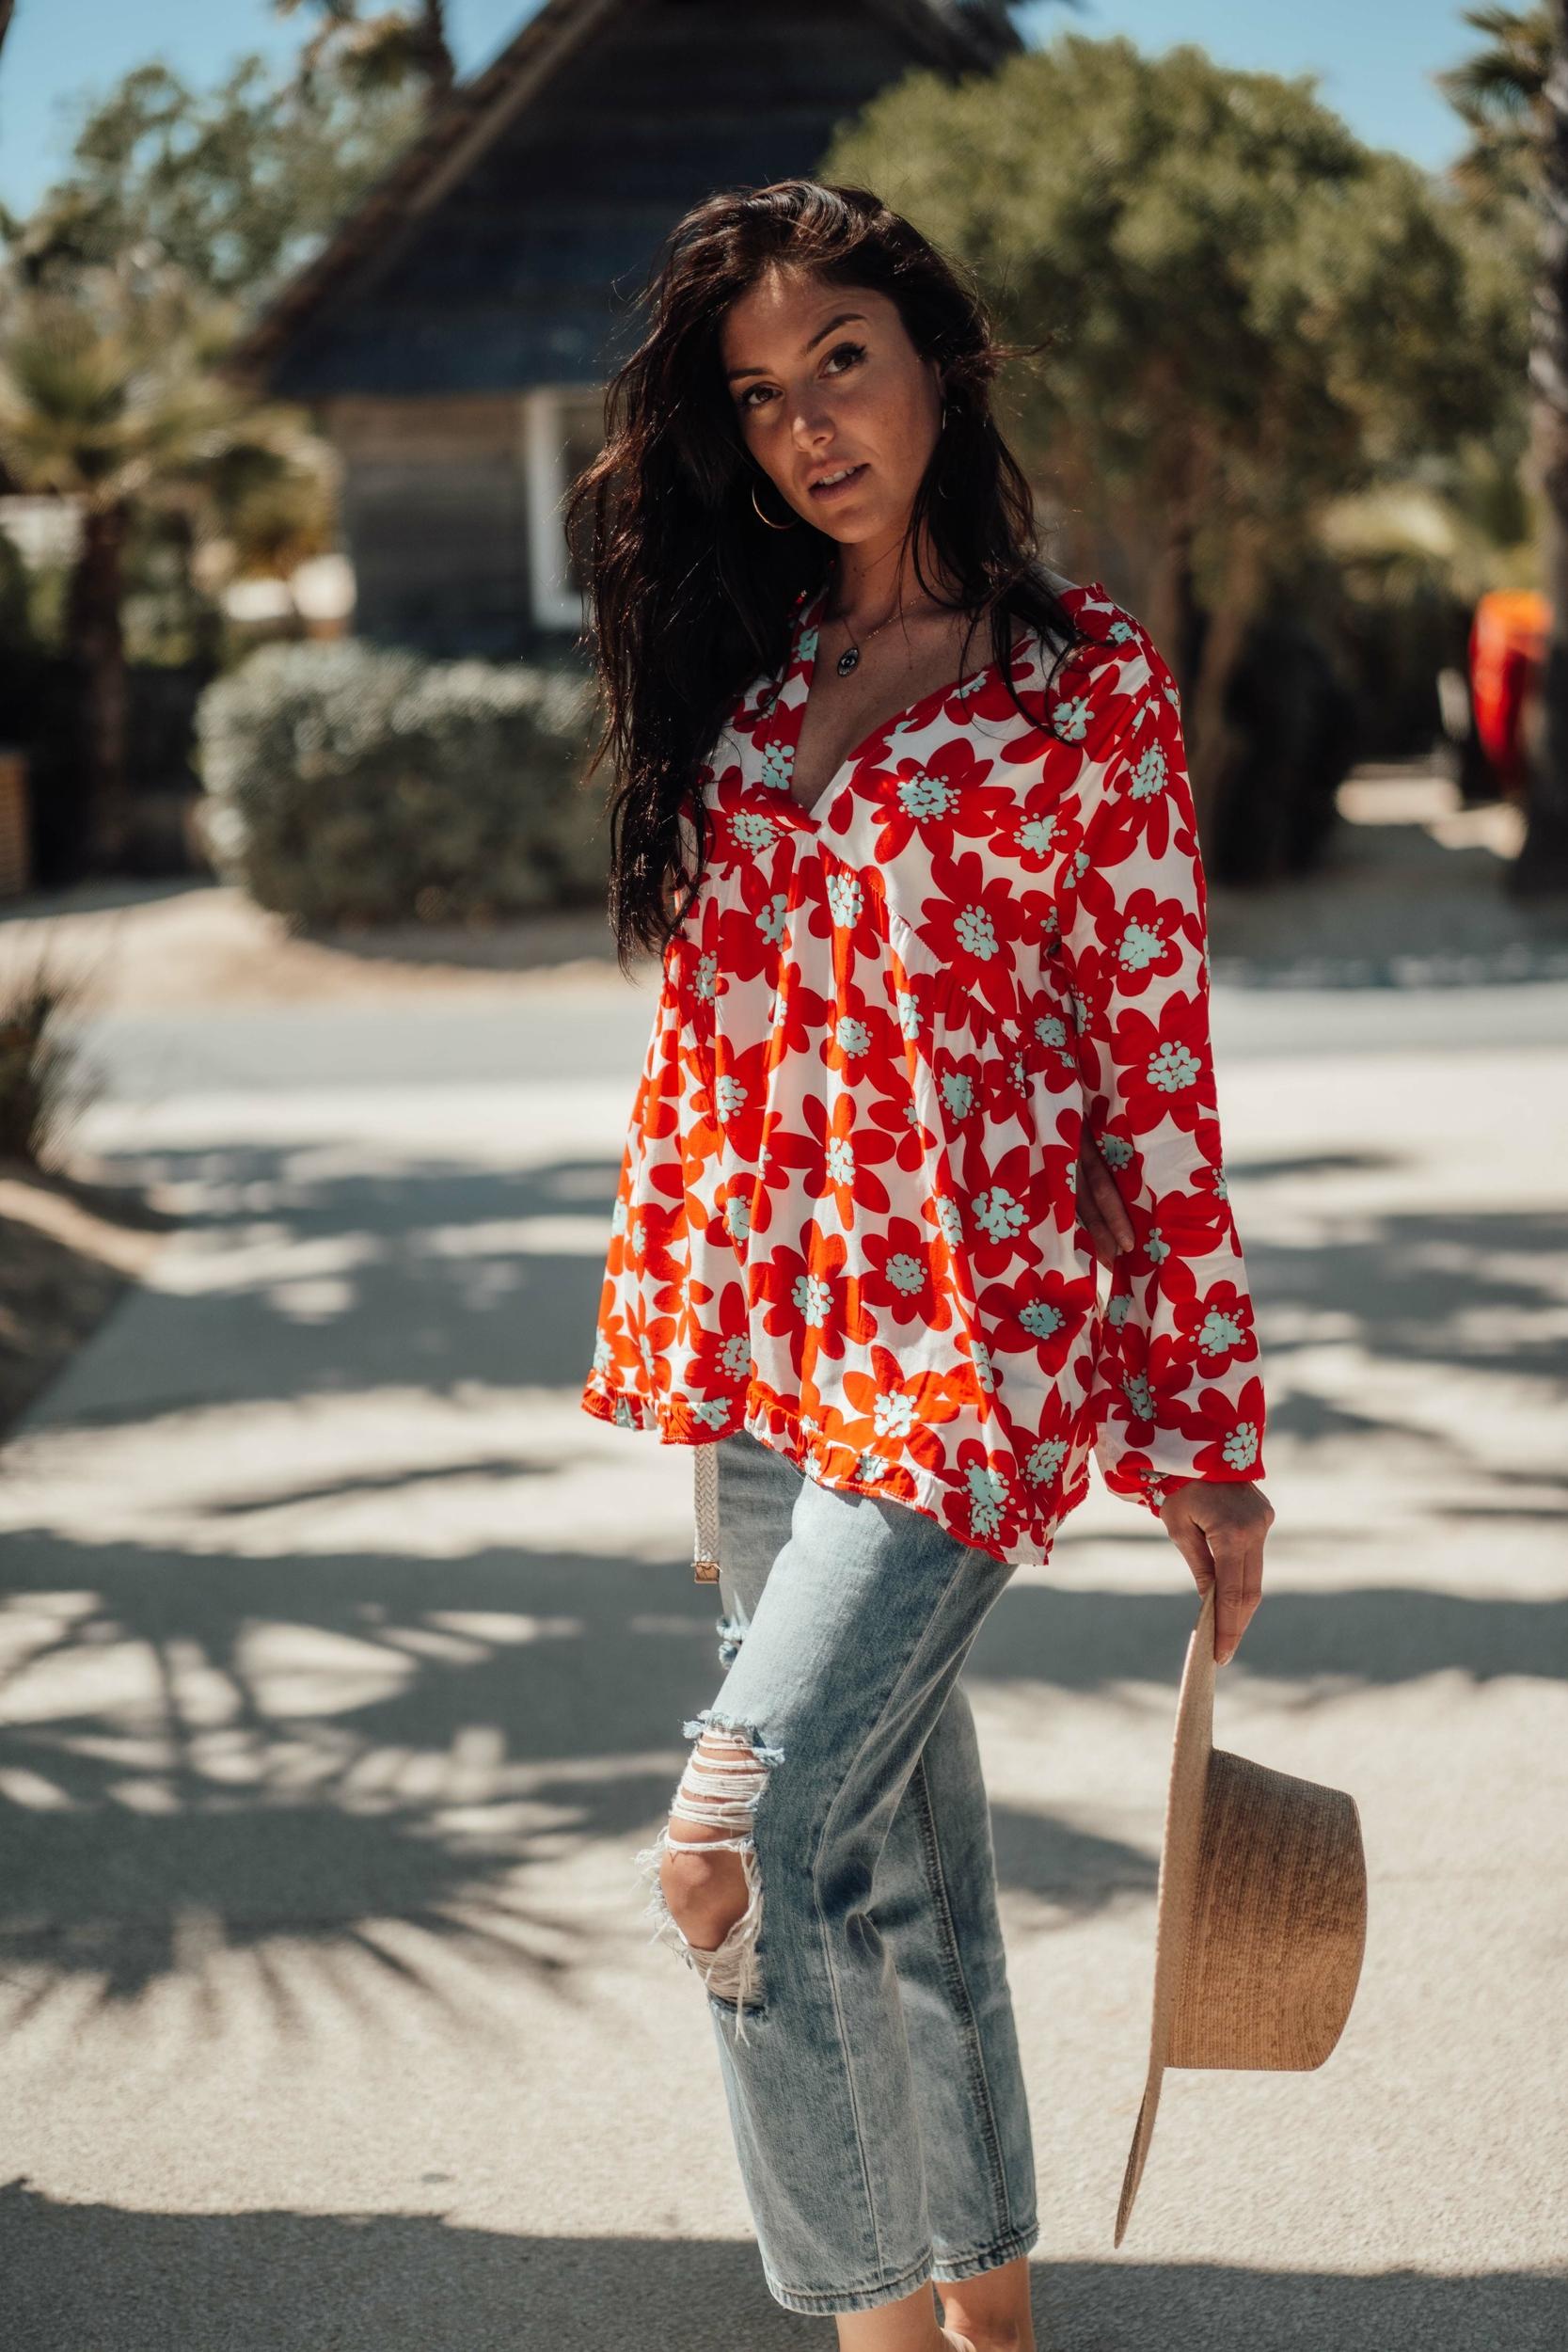 blouse_dixie_banditasPM-643